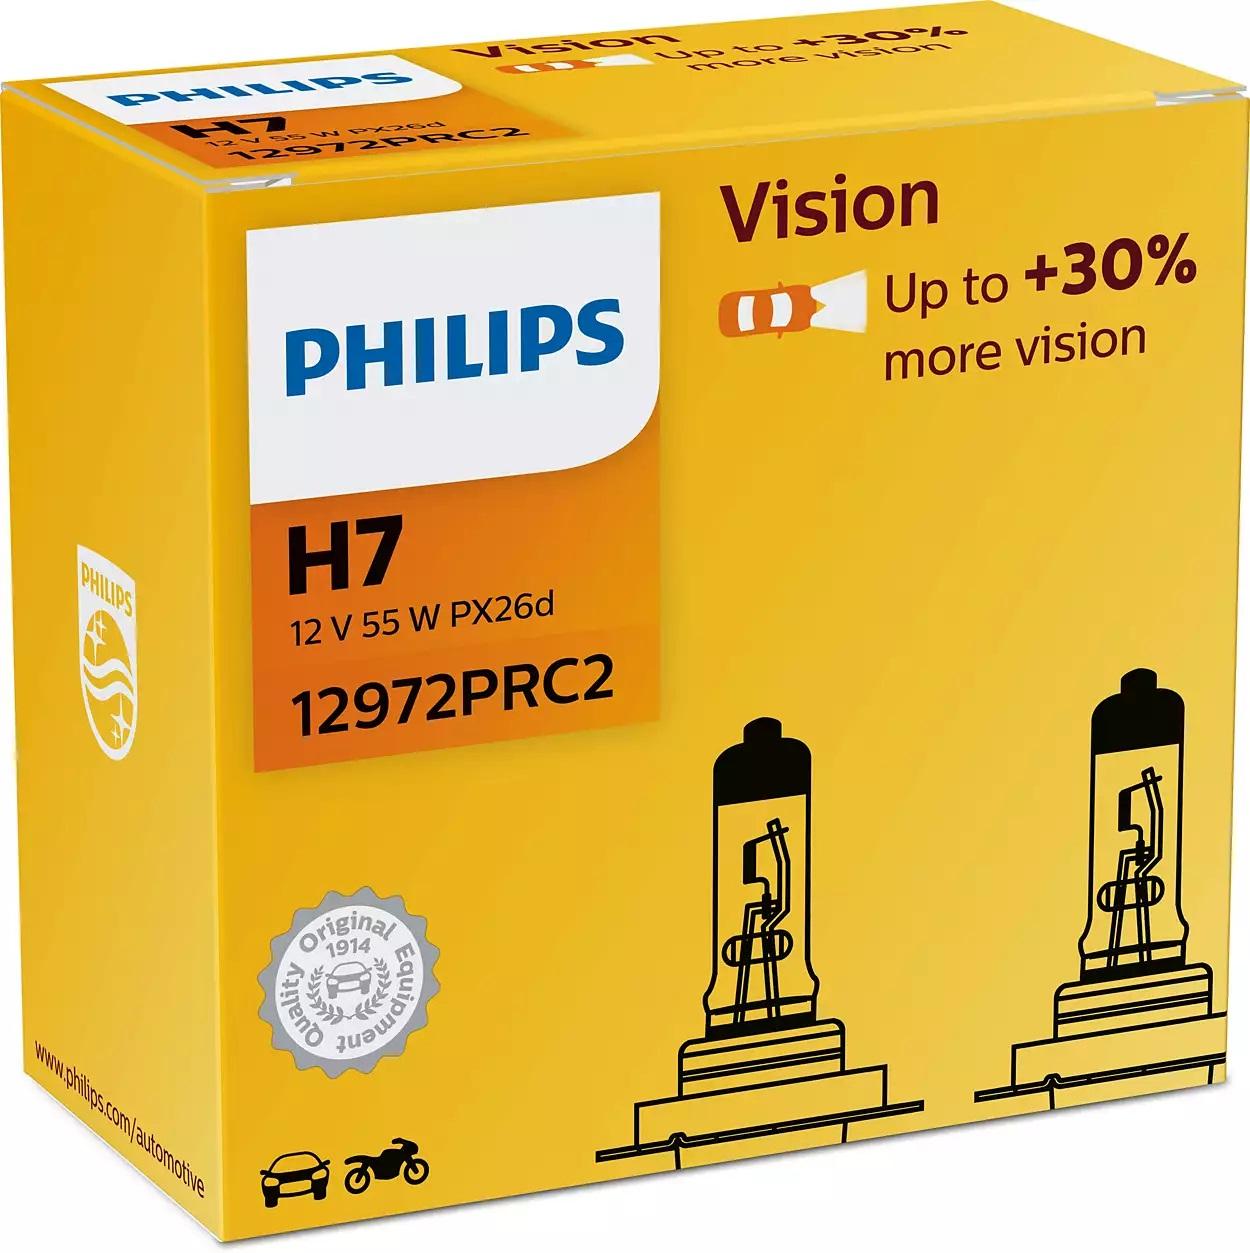 Philips Vision+30% 12972PRC2 H7 PX26d 12V 55W 2ks duopack